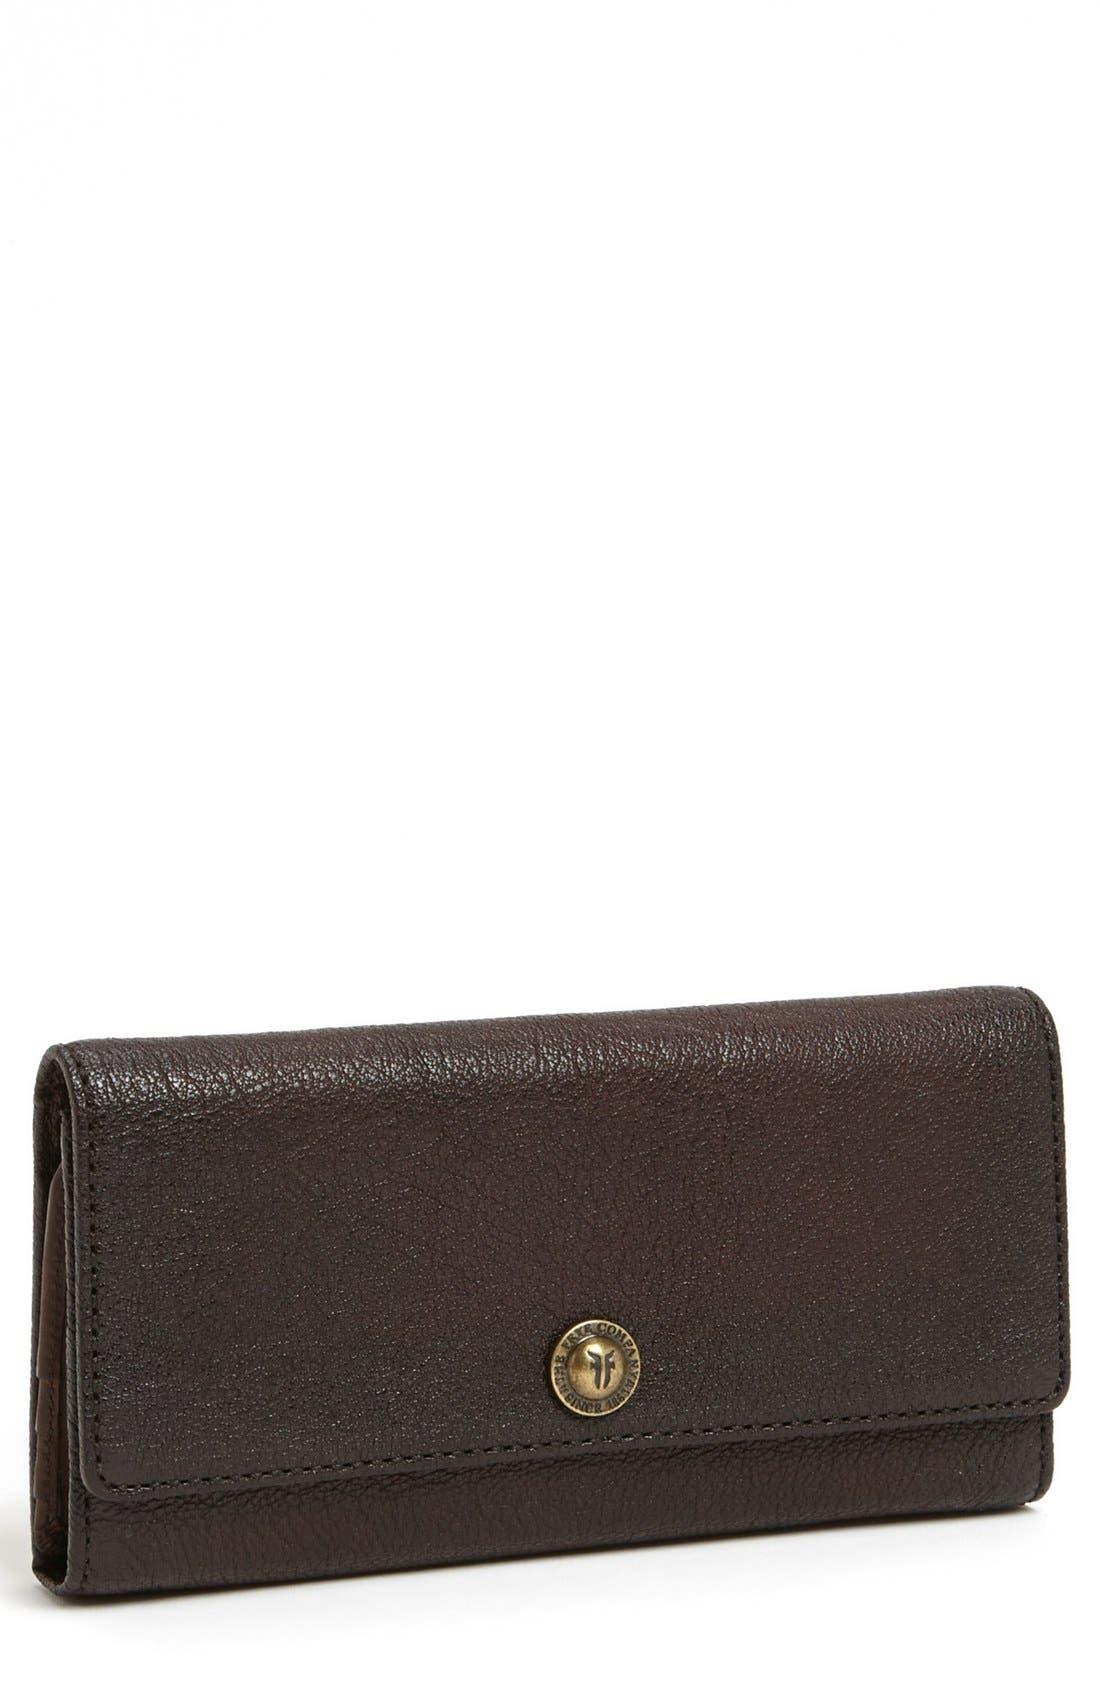 Alternate Image 1 Selected - Frye 'Melissa' Leather Wallet